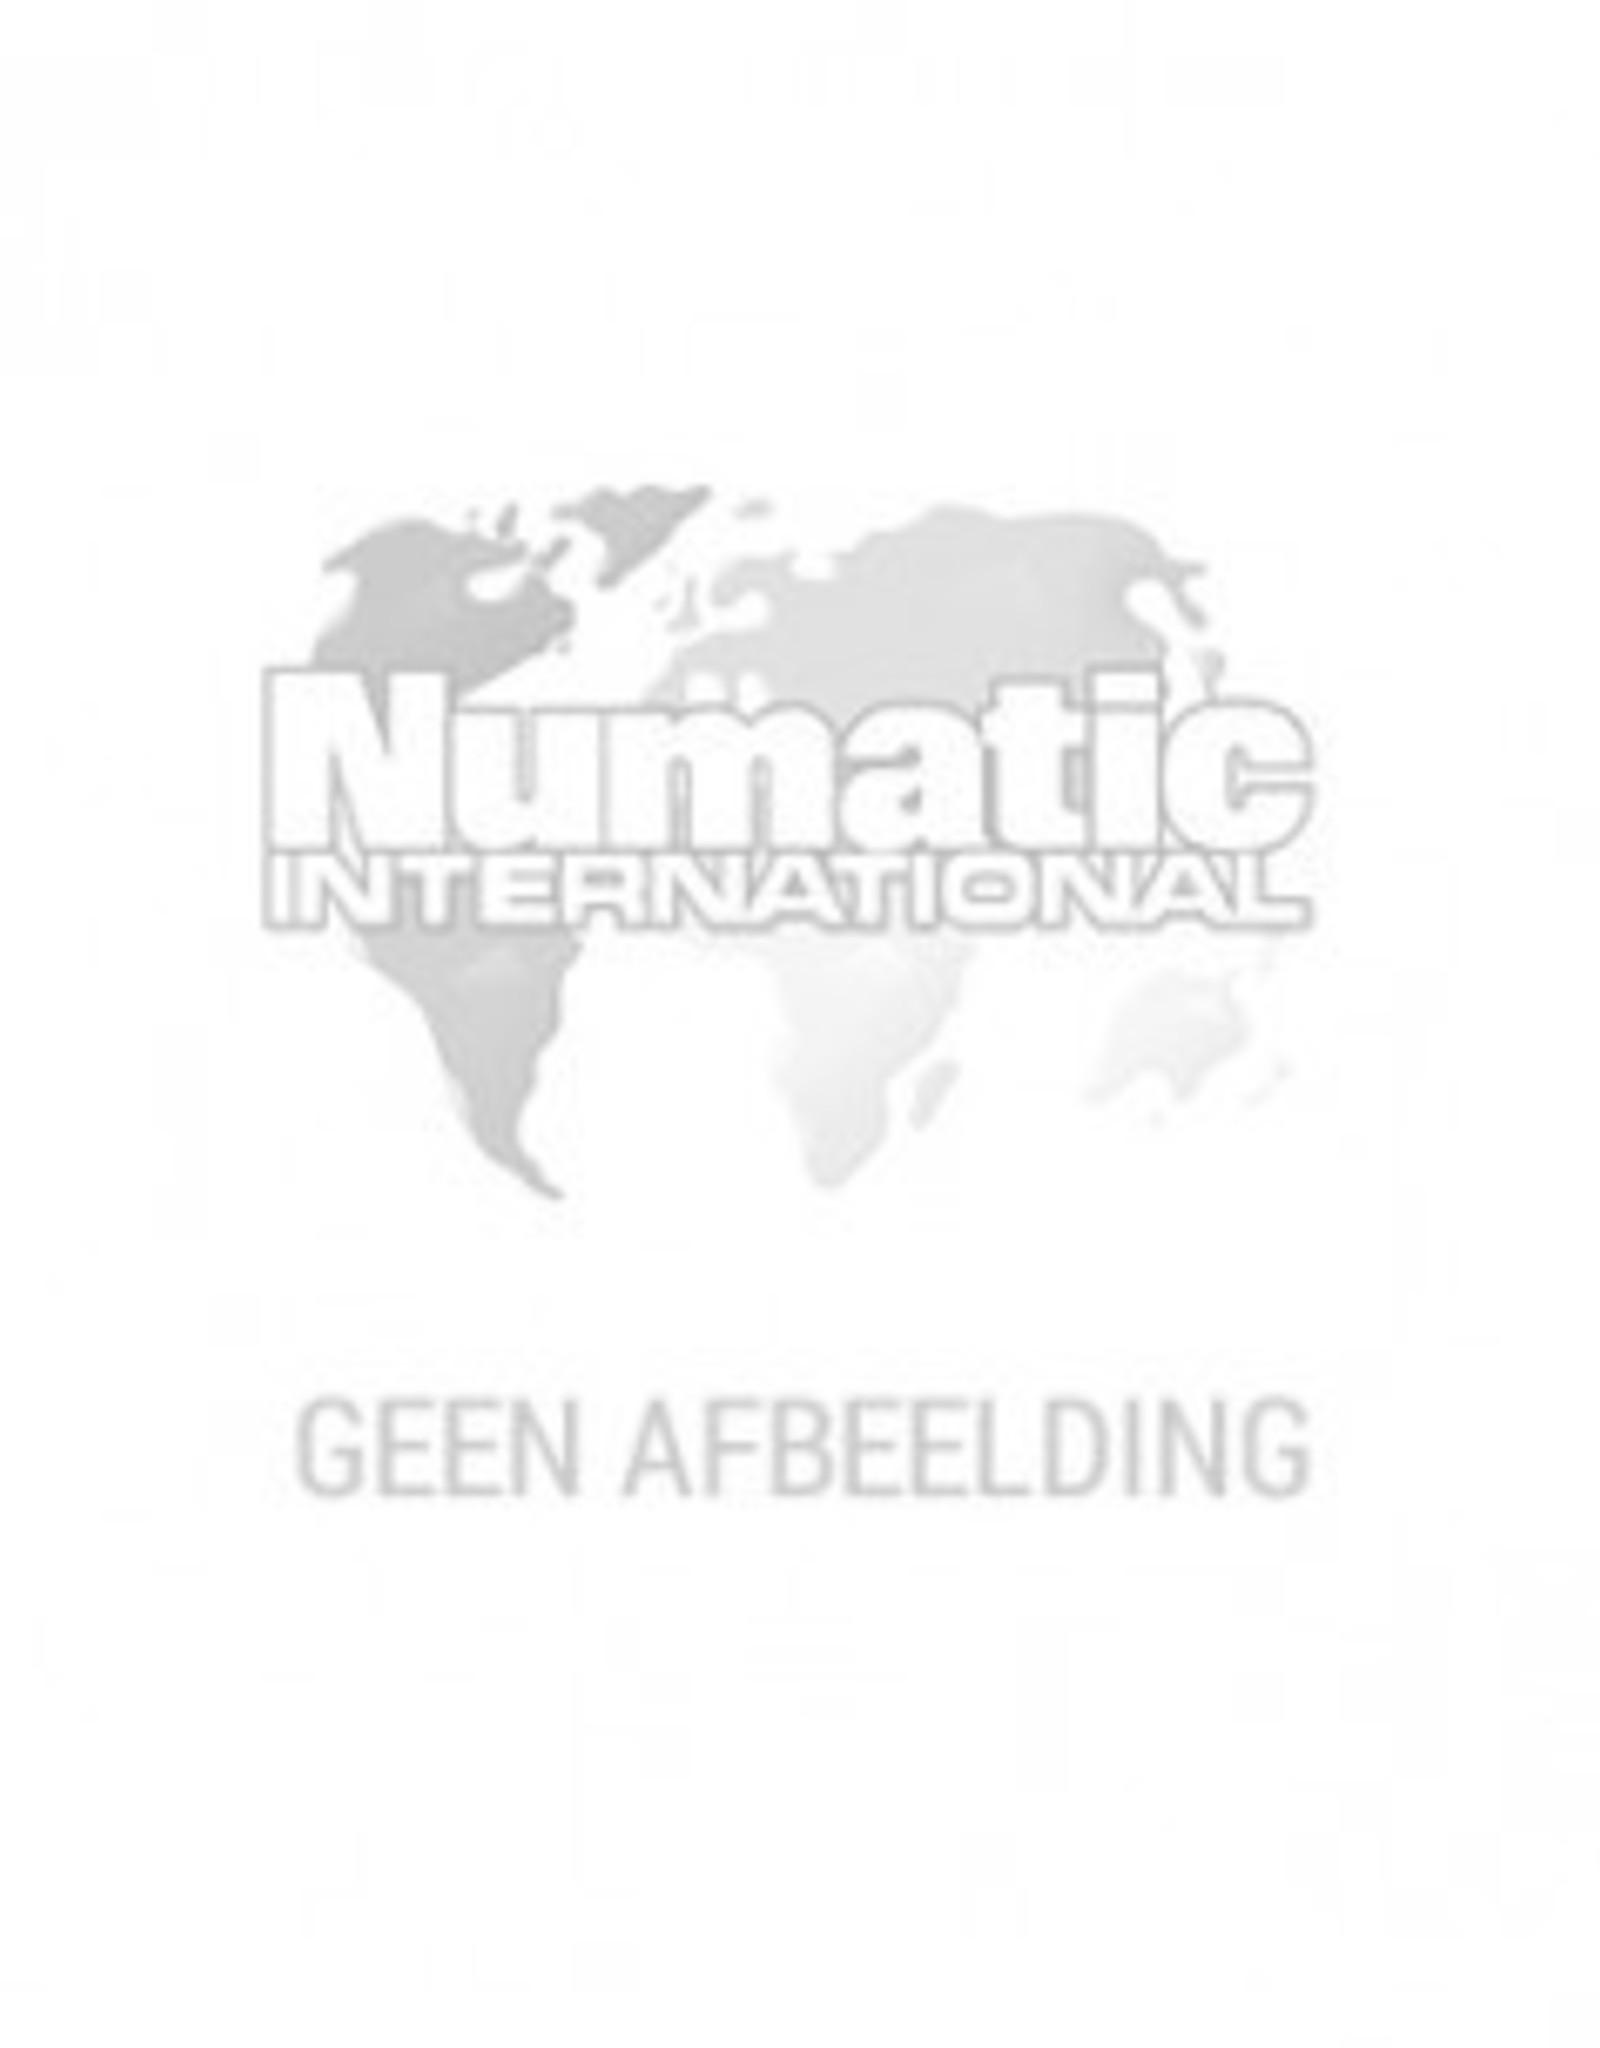 NUMATIC 235MM LONG X 1/2 INCH DIAMETER X 18G STAINLESS STEEL TUBE